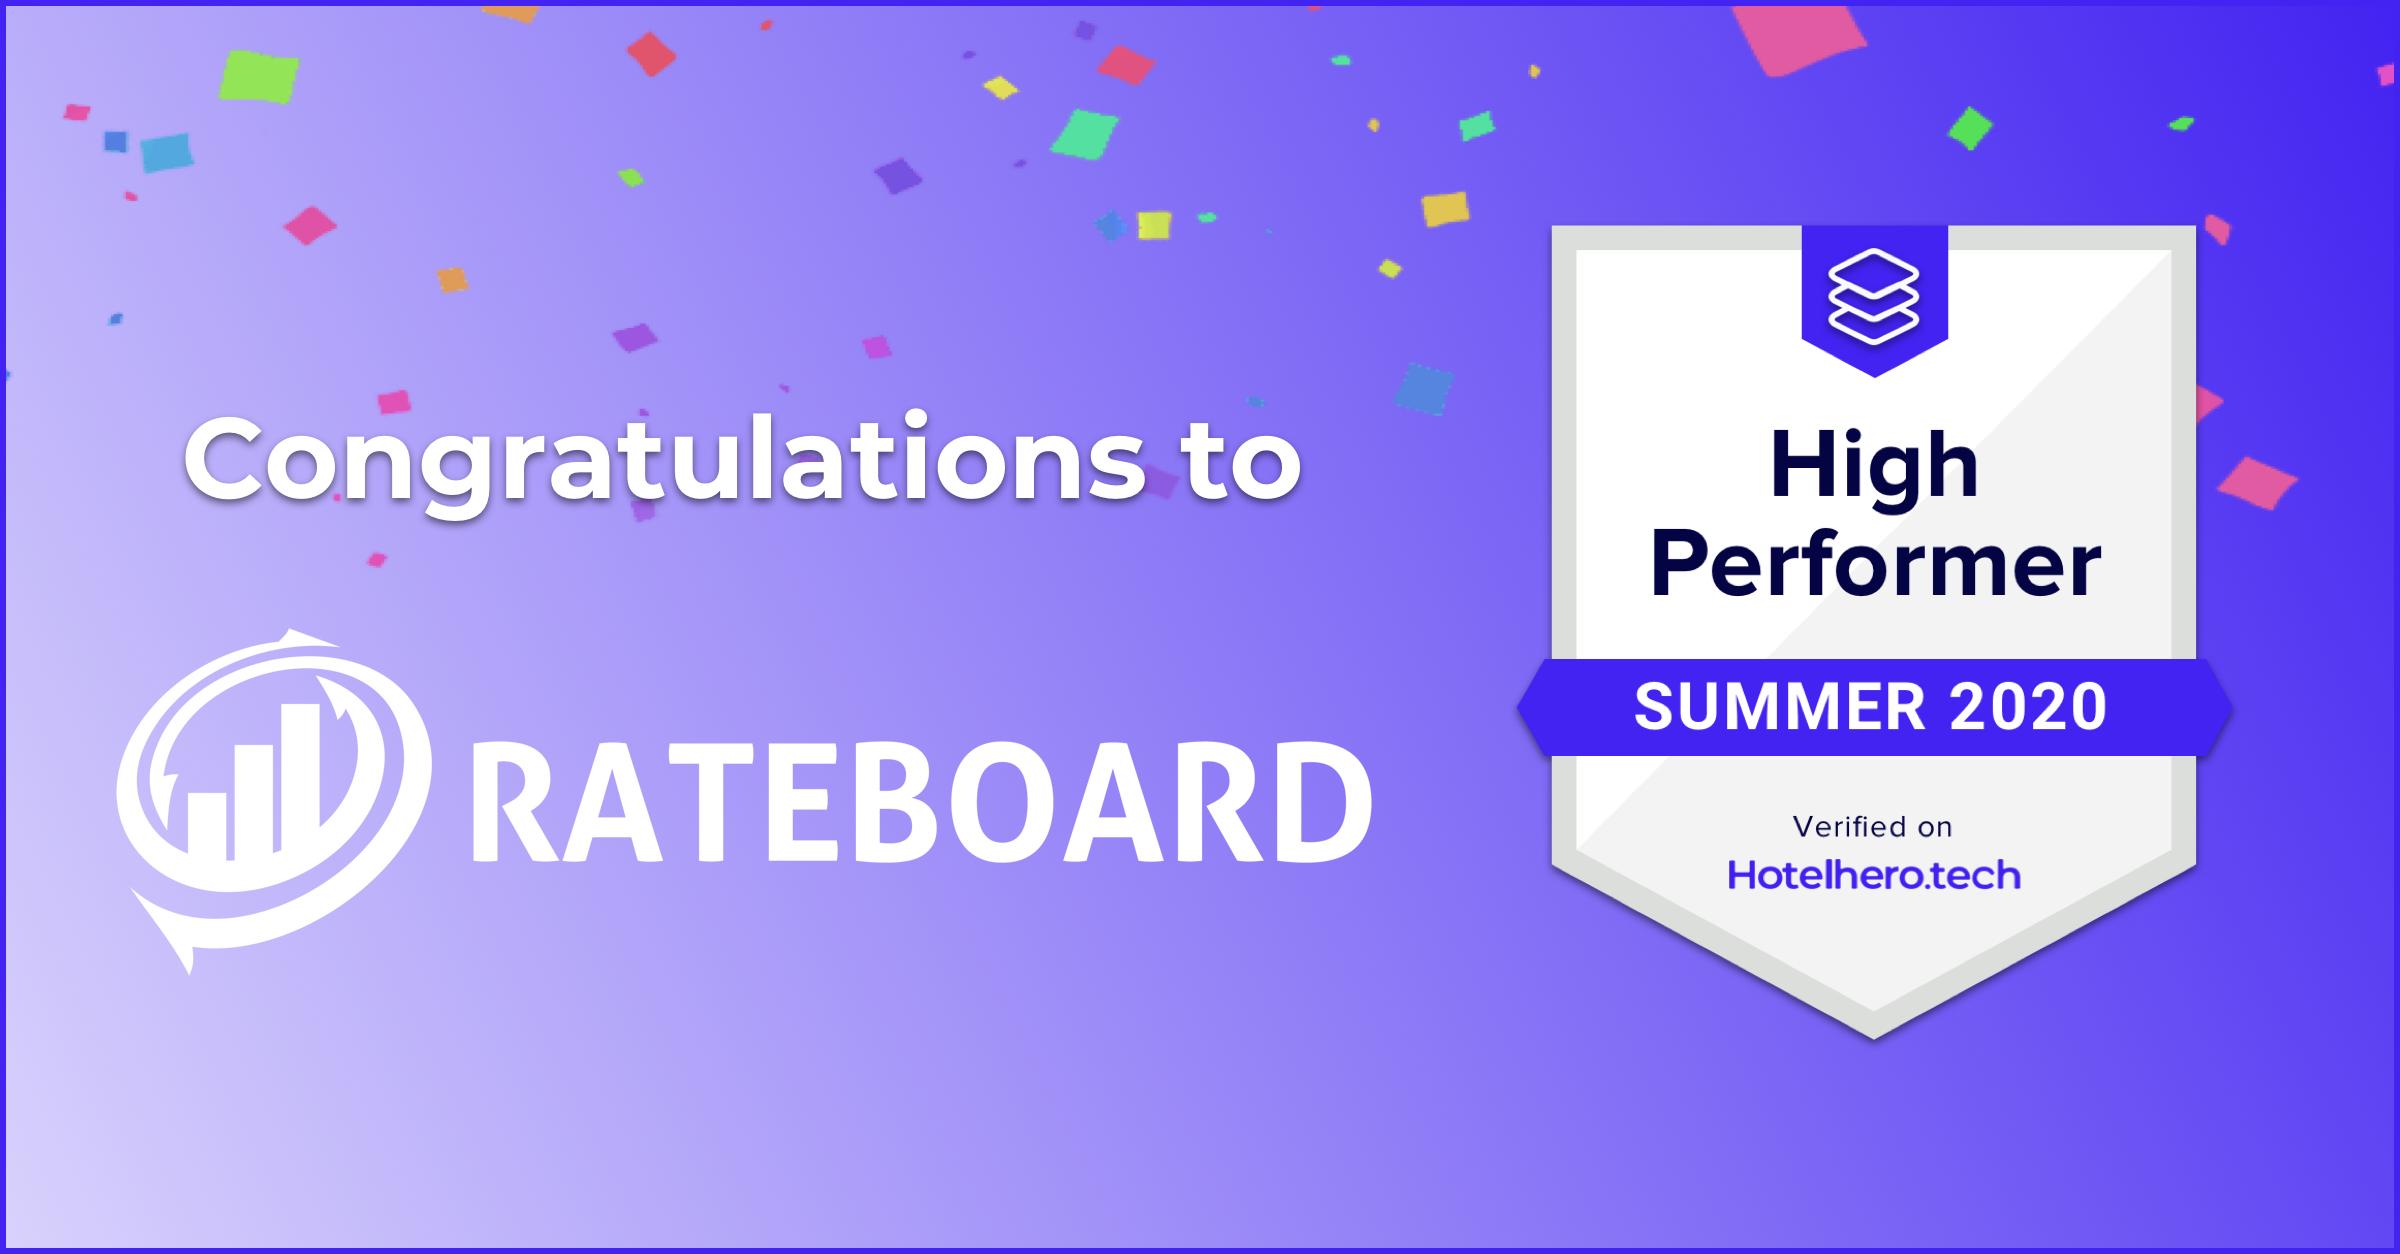 Rateboard earns Hotelhero High Performer badge